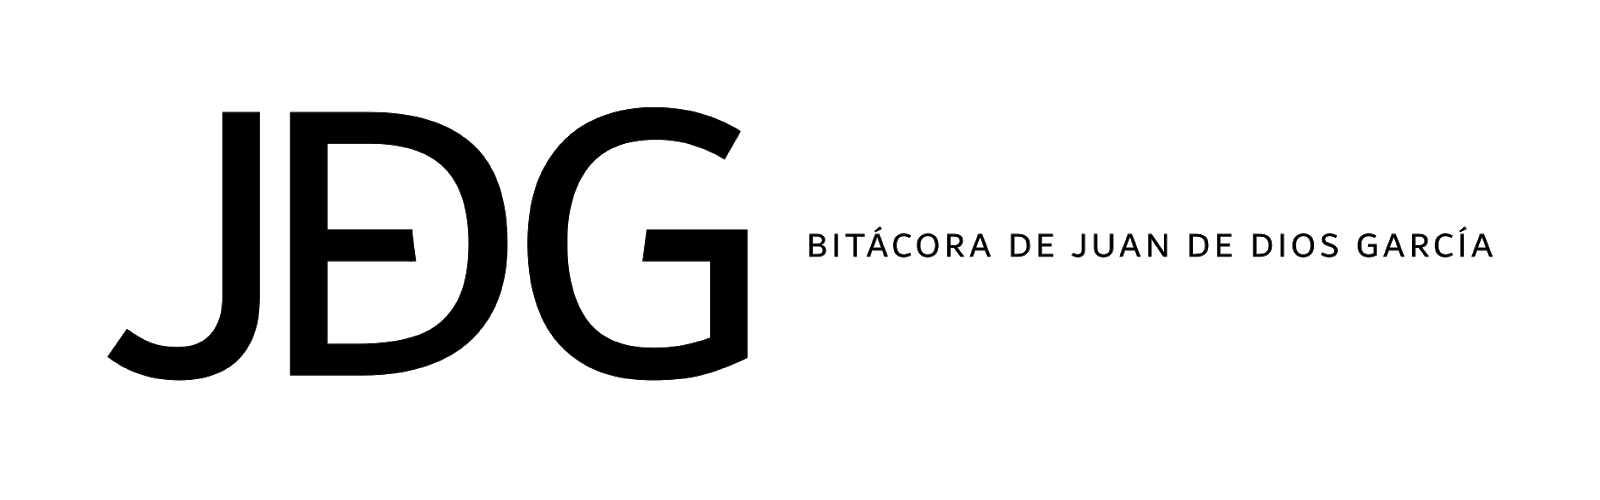 Bitácora de Juan de Dios García